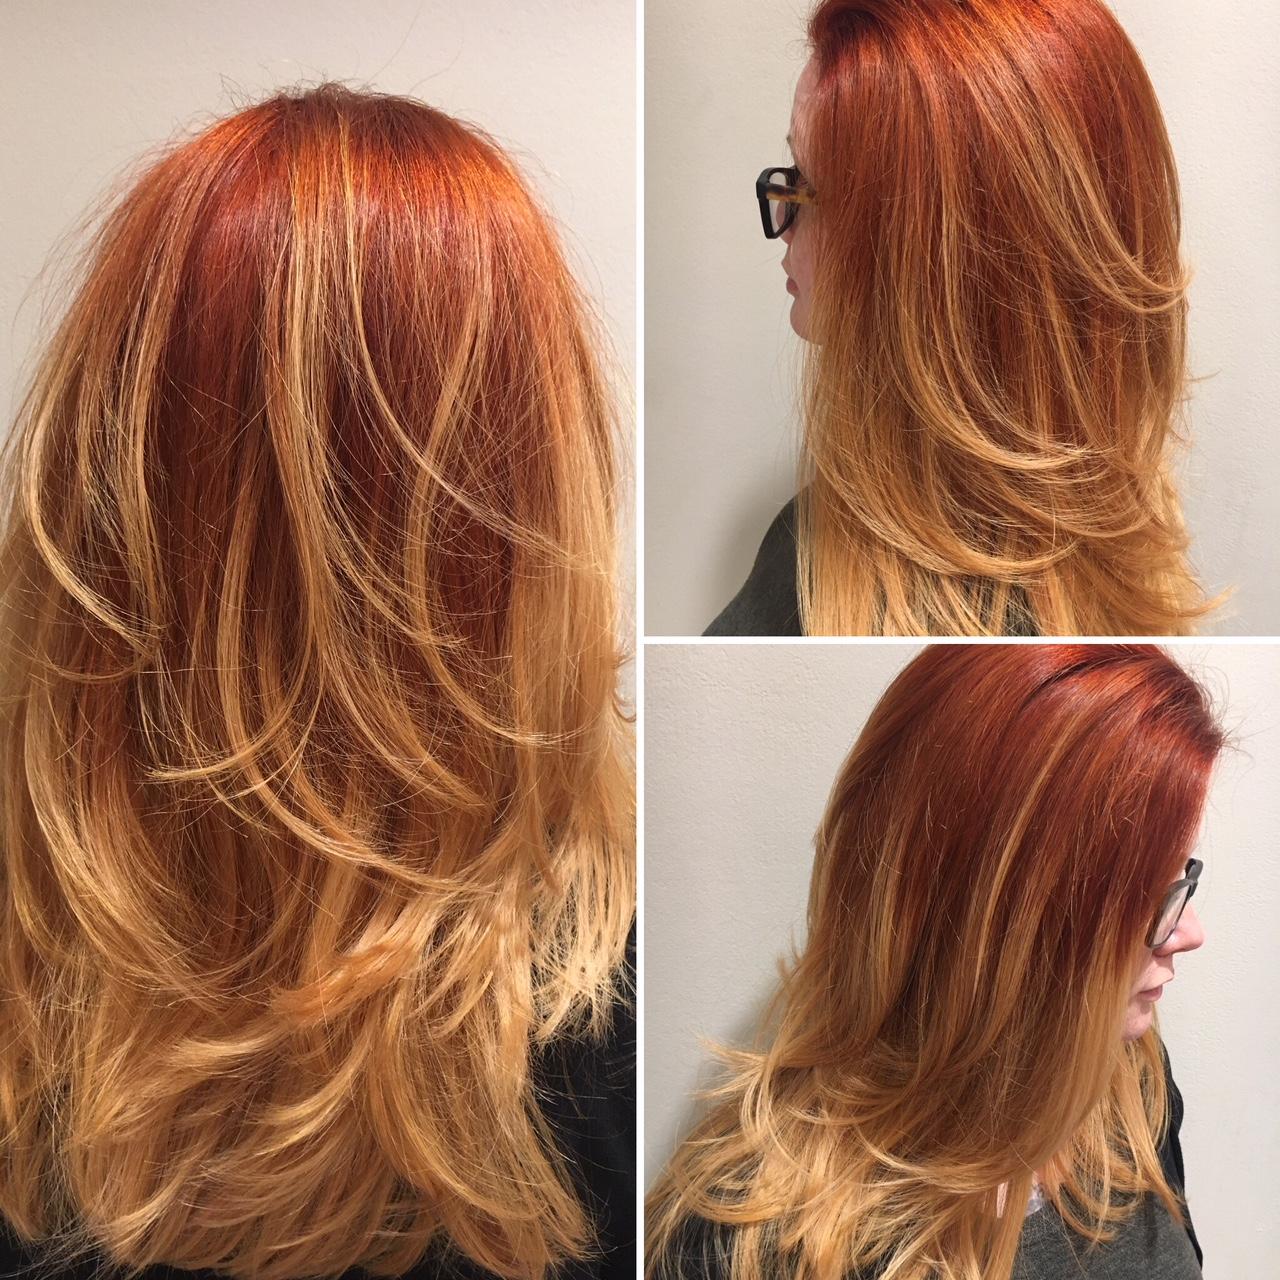 Hair by Saul